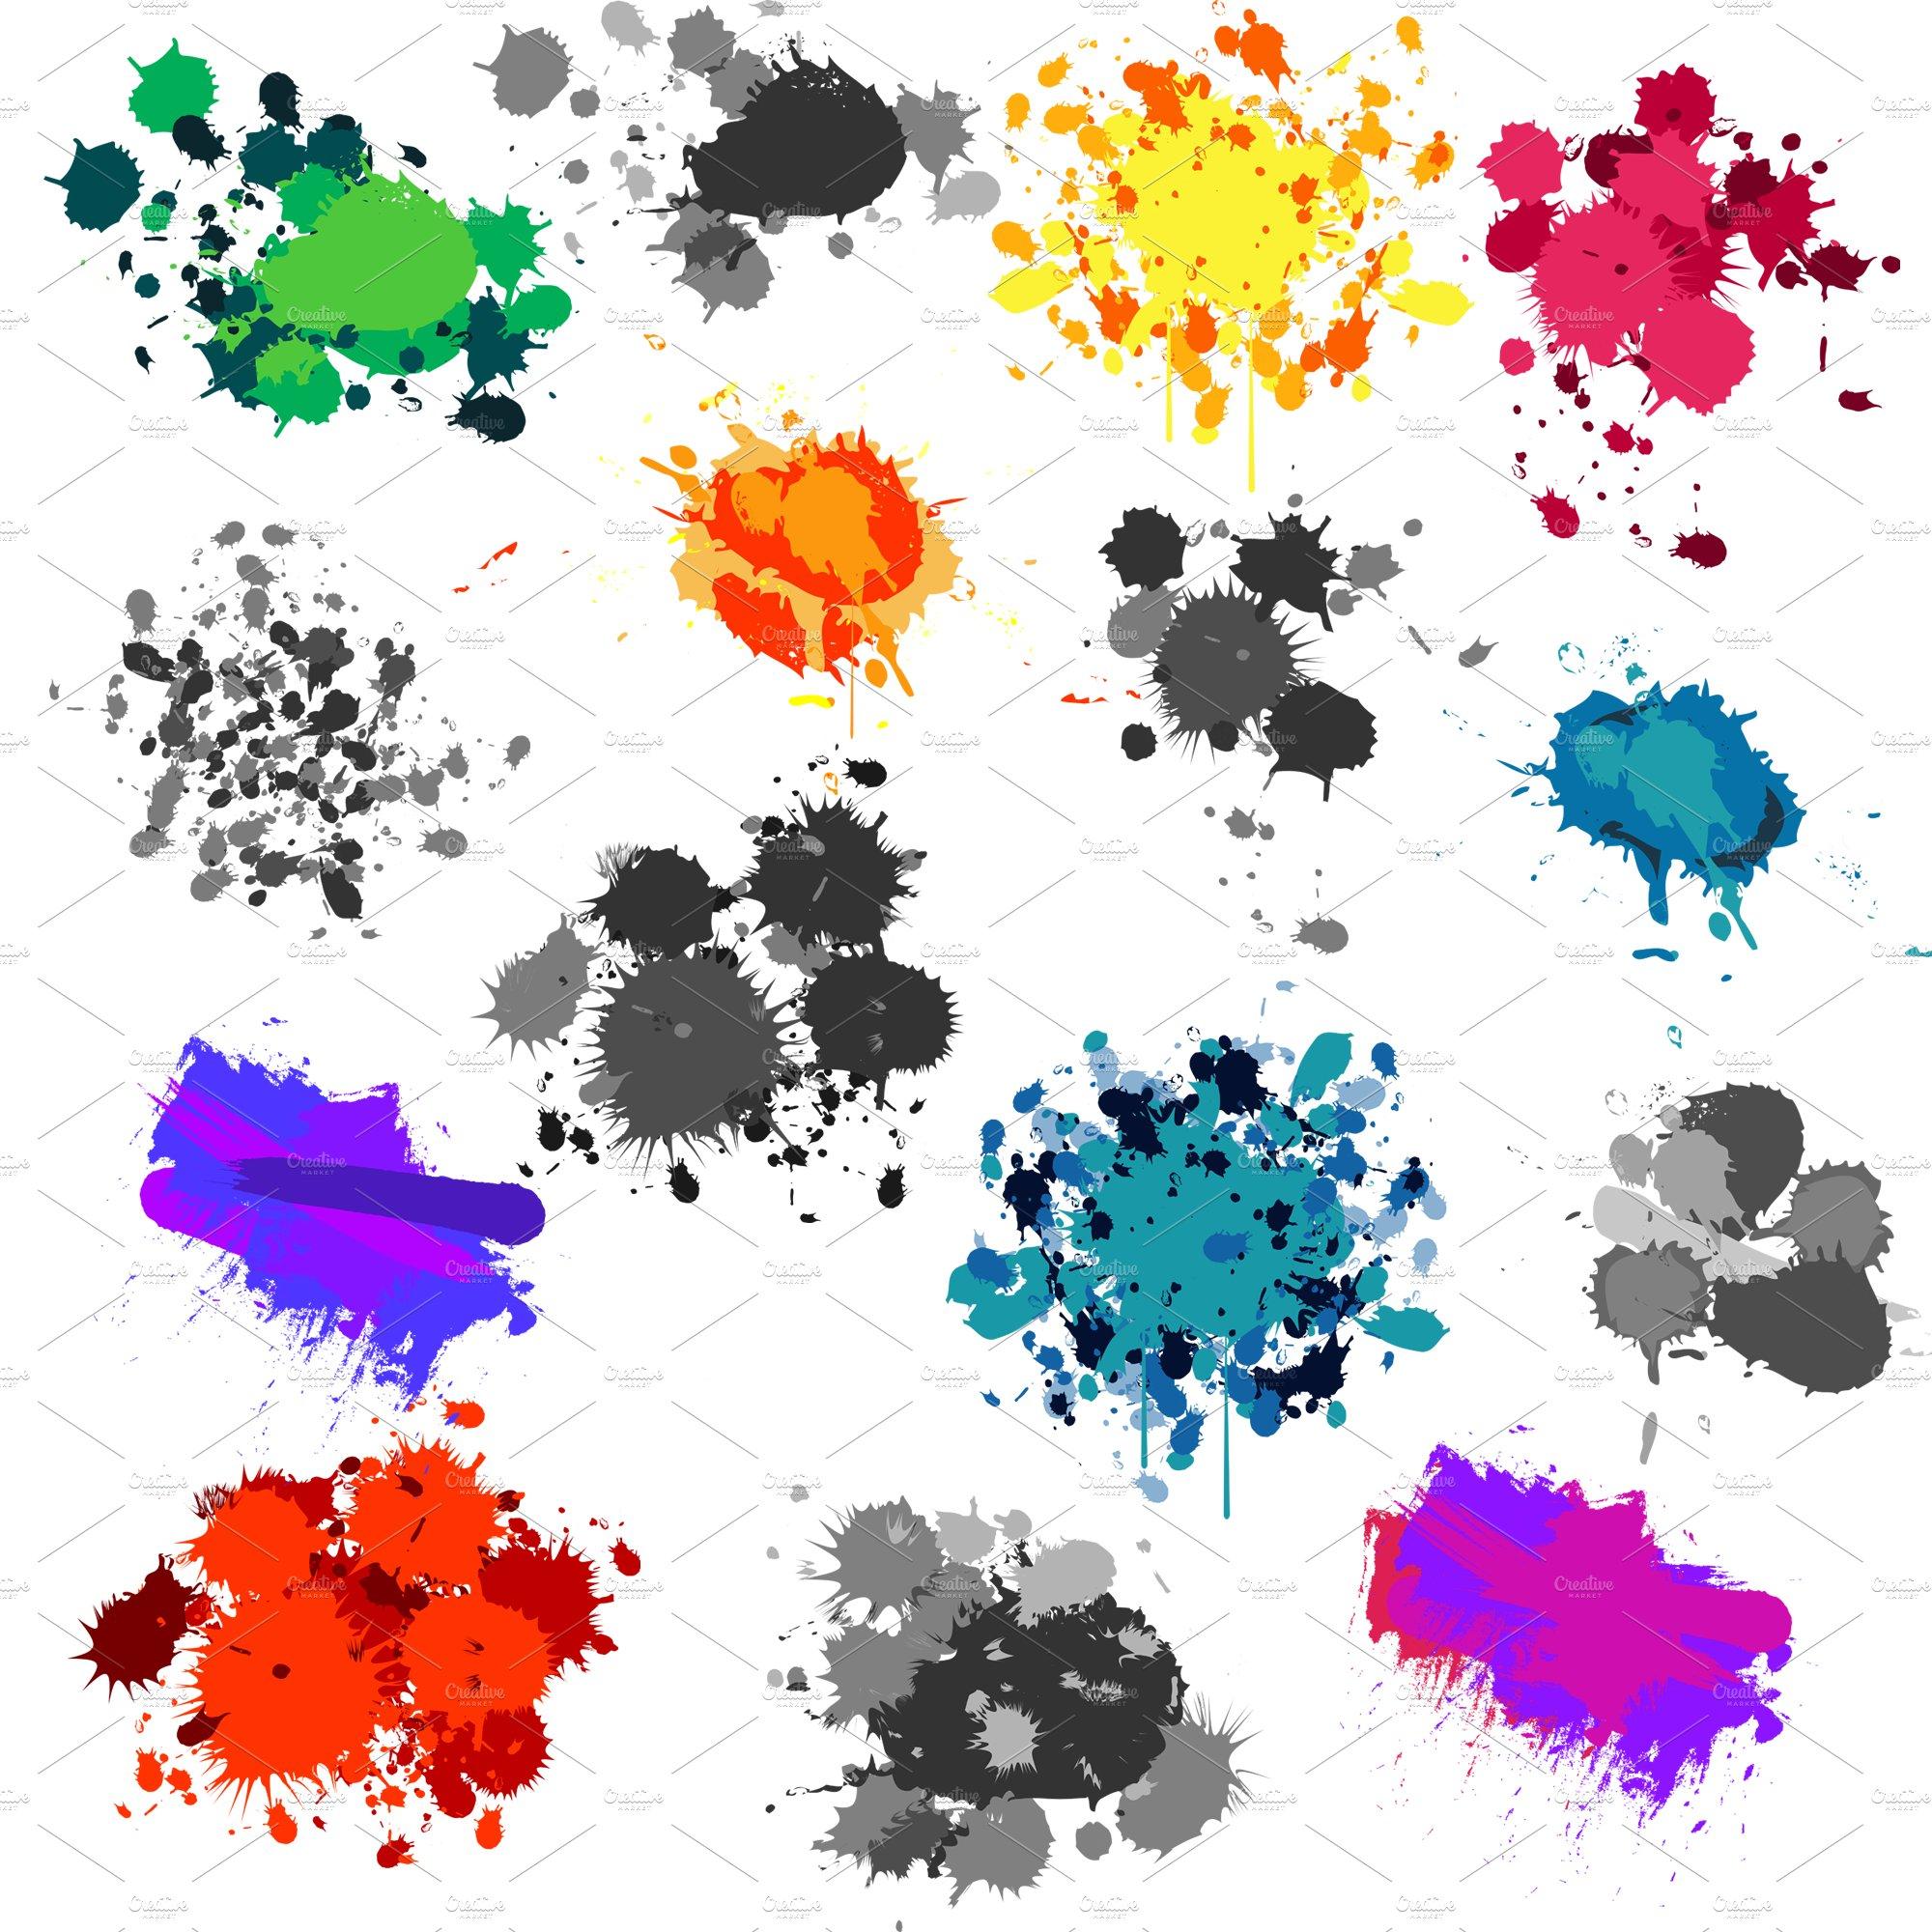 Paint Splatters Vectors And Clipart